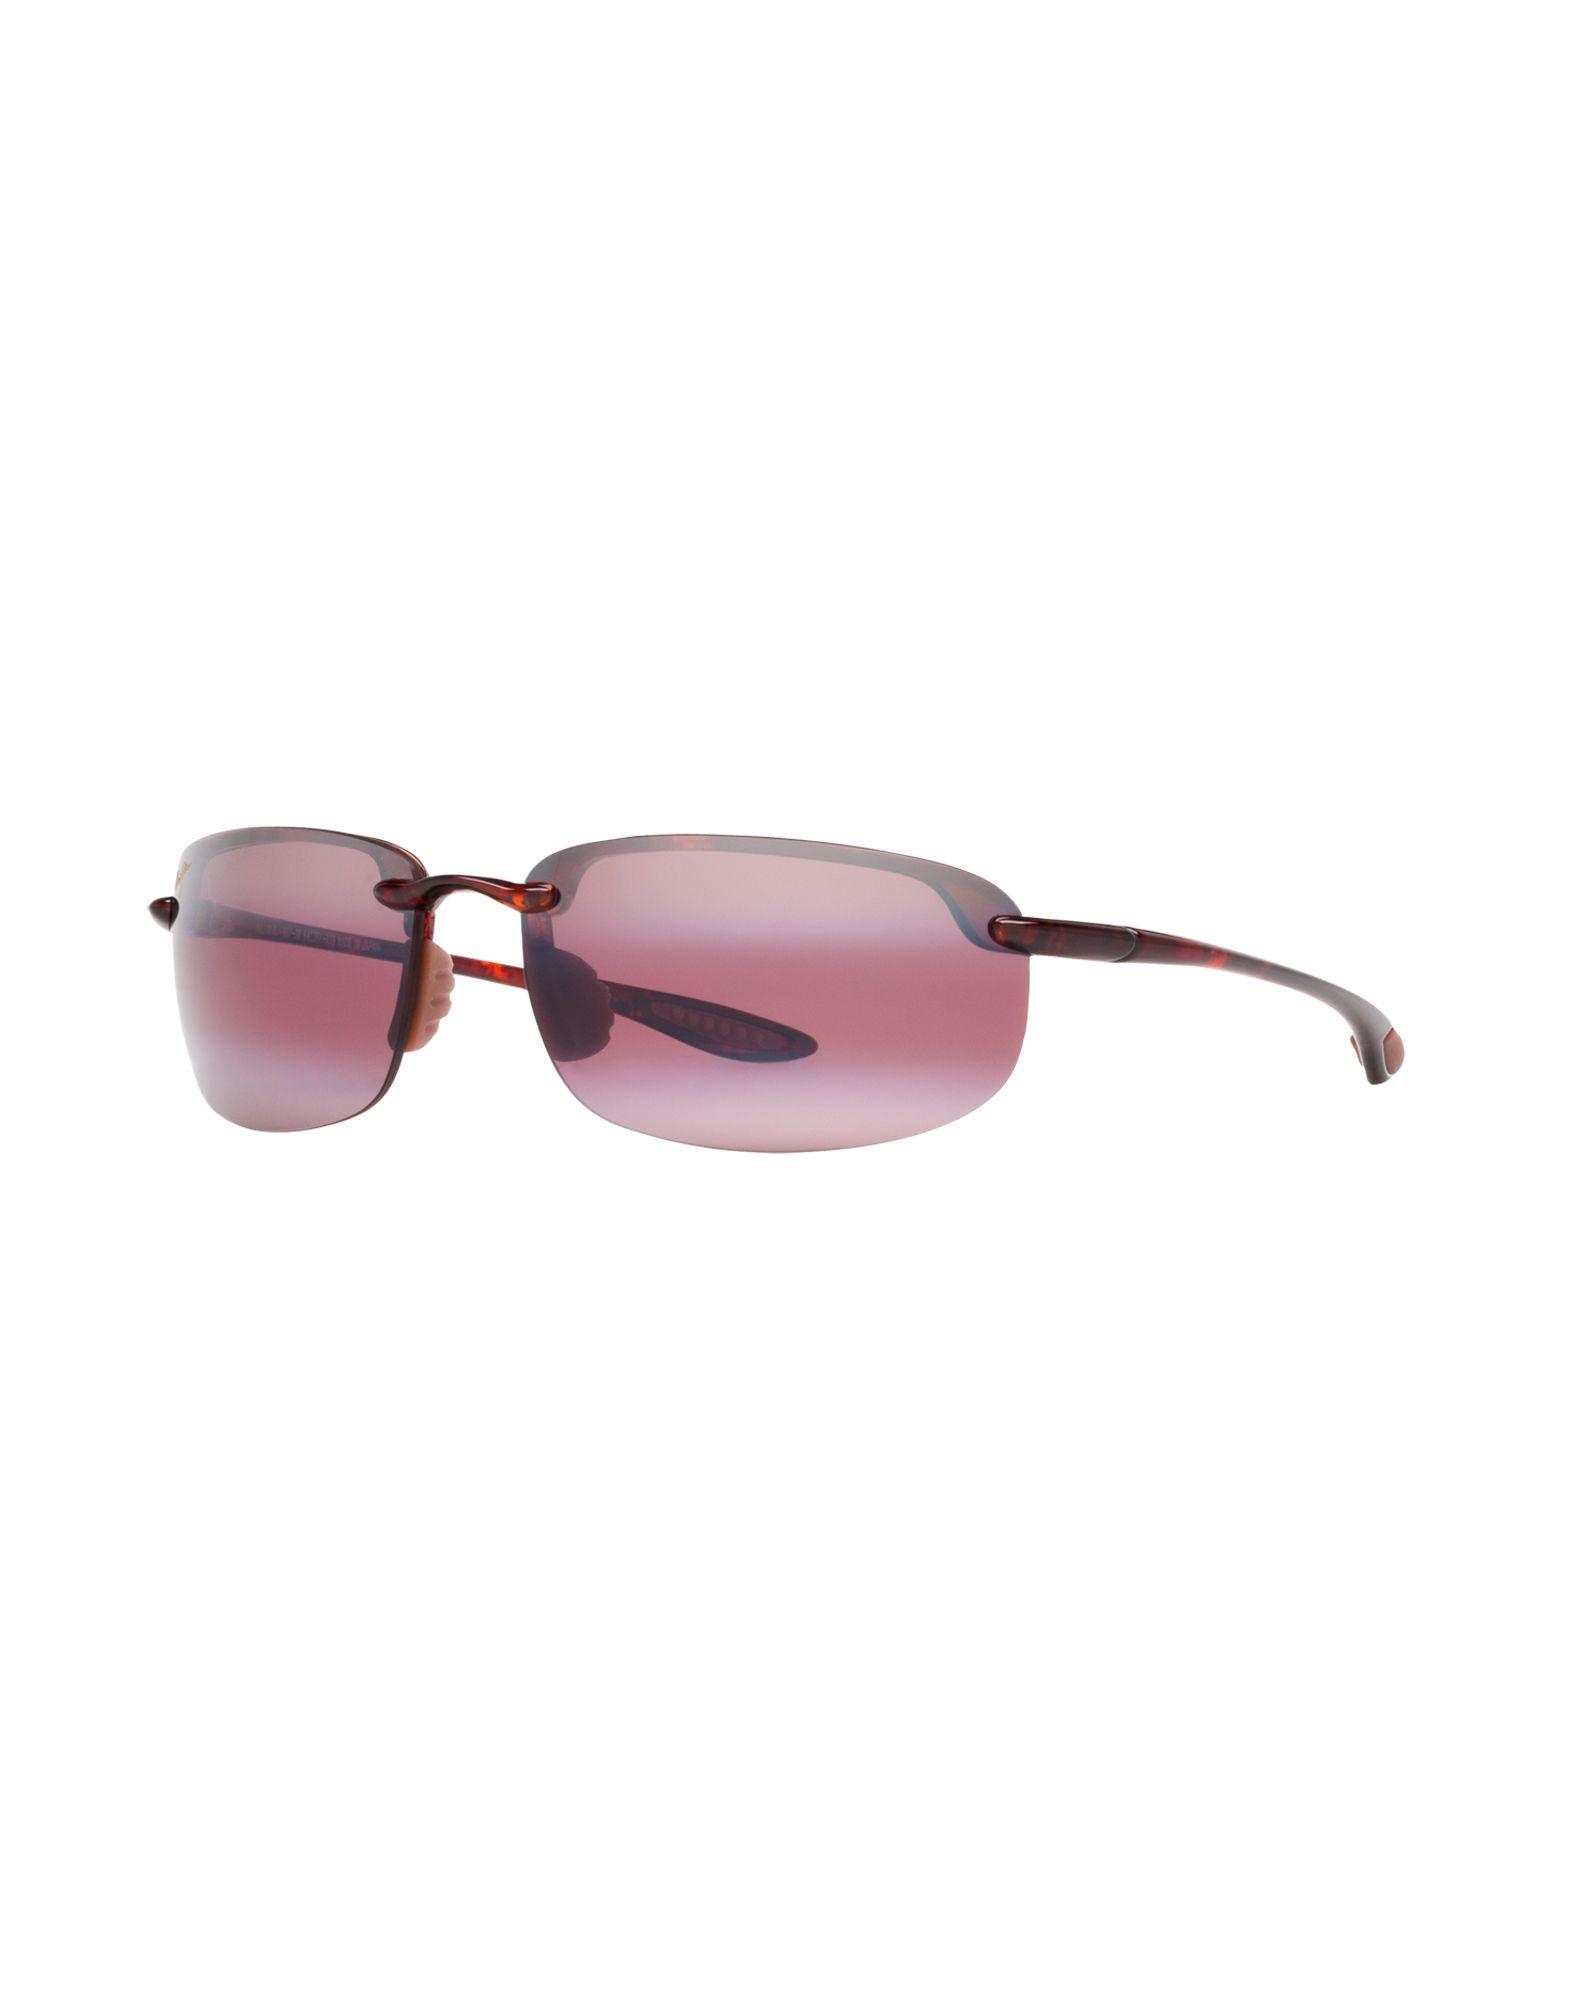 Maui jim Sunglasses in Purple (Maroon)